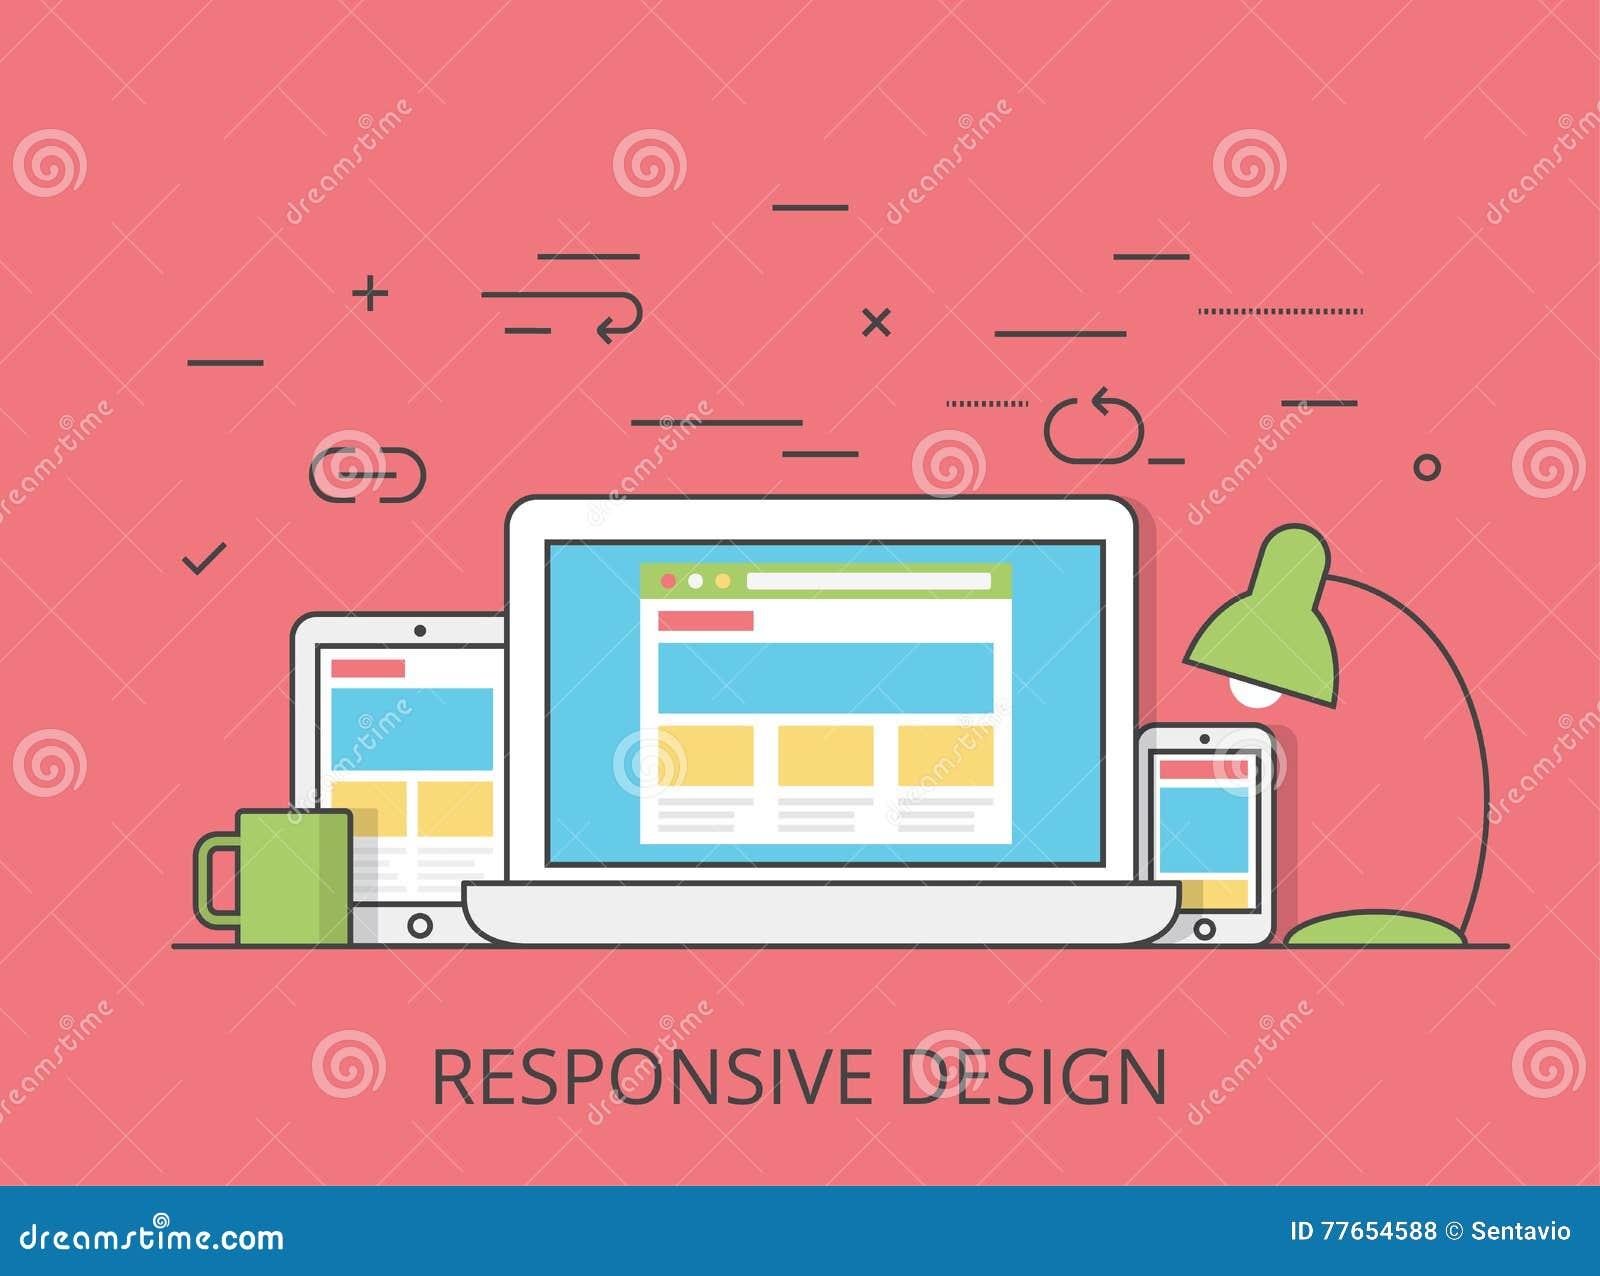 Lineart flat software responsive web design vector cartoon for App layout design software